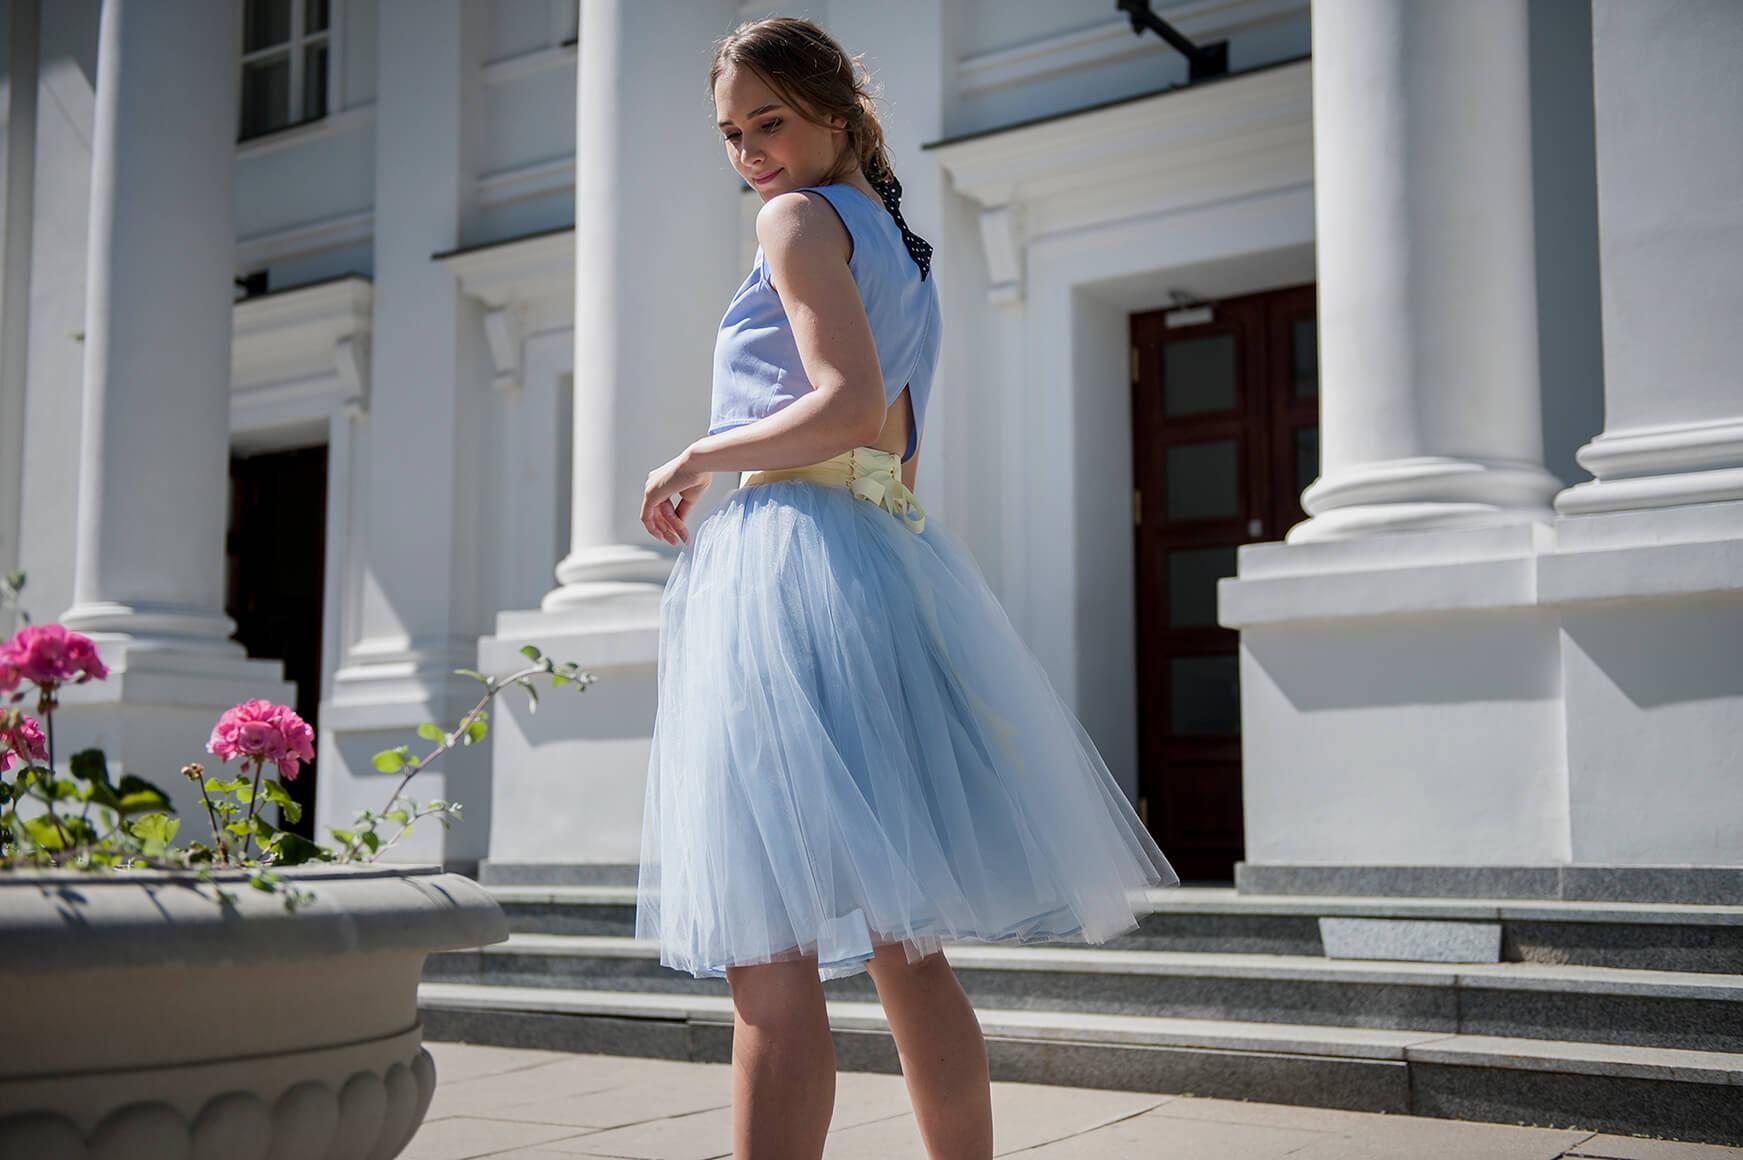 spódnica tiulowa na wesele